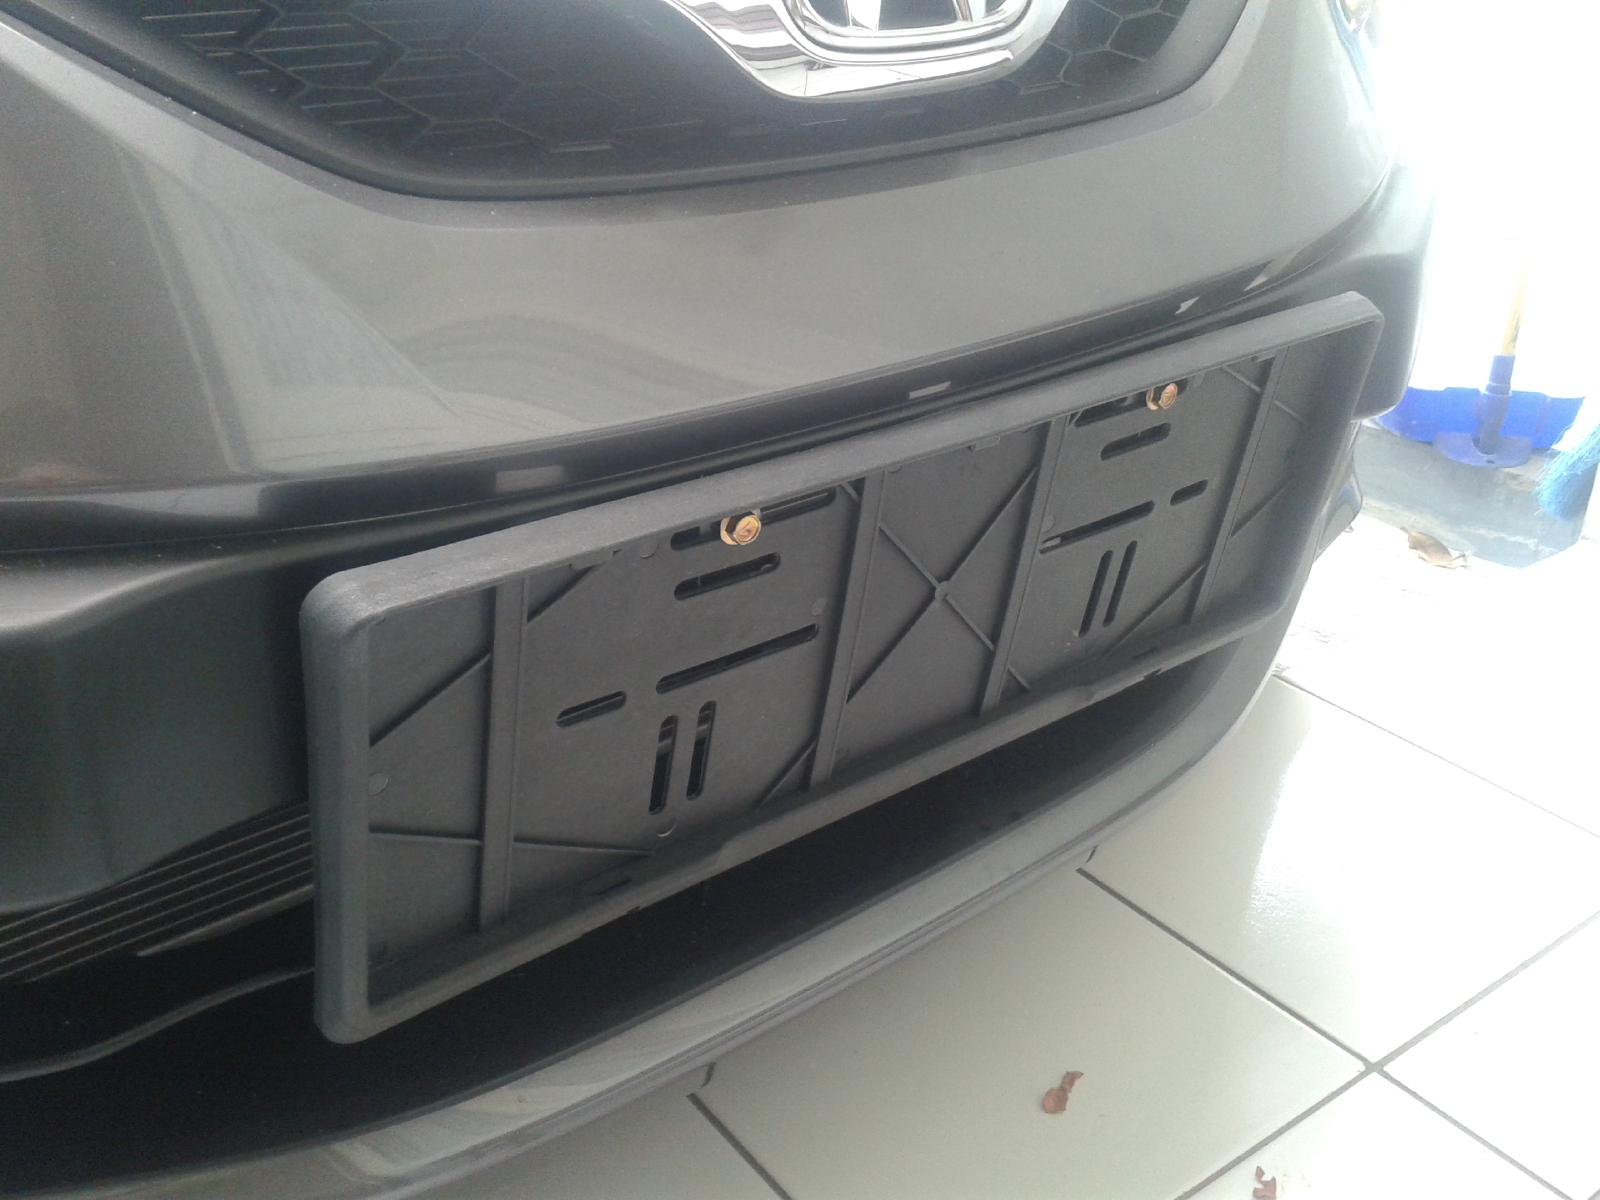 Cara Memasang Plat Nomor Mobil Cover Izy 1 Pasang Frame Nomer Depan